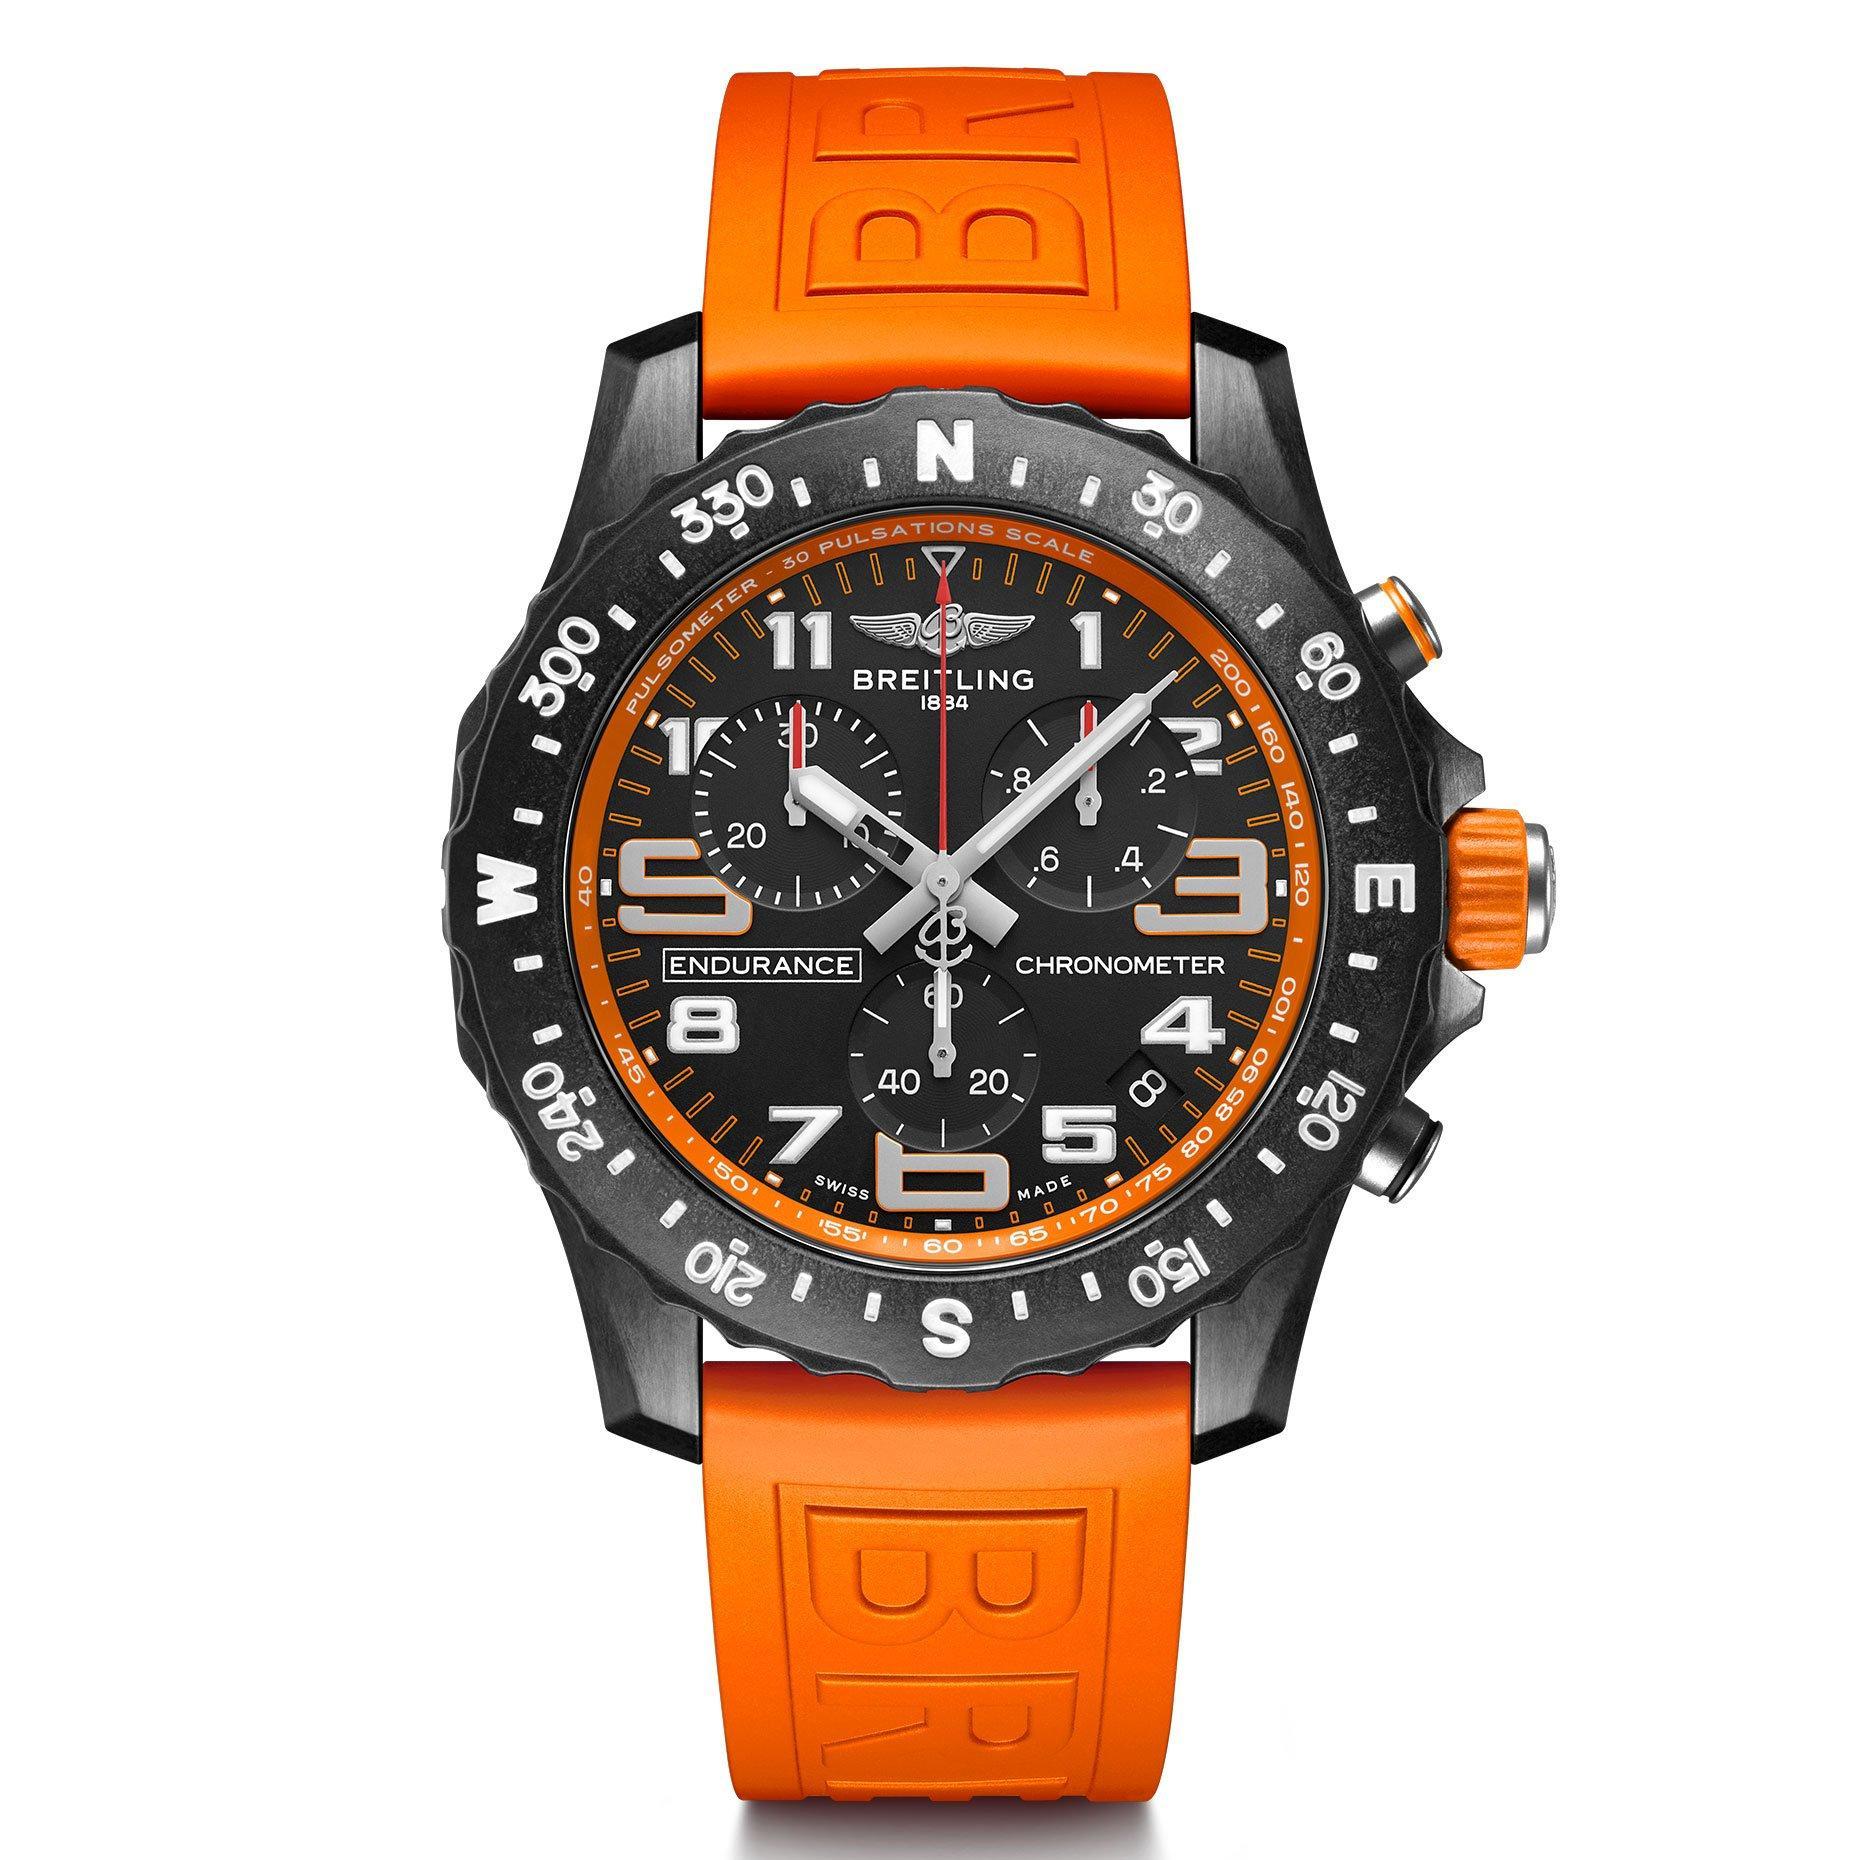 Breitling Endurance Pro Chronometer Orange Men's Watch